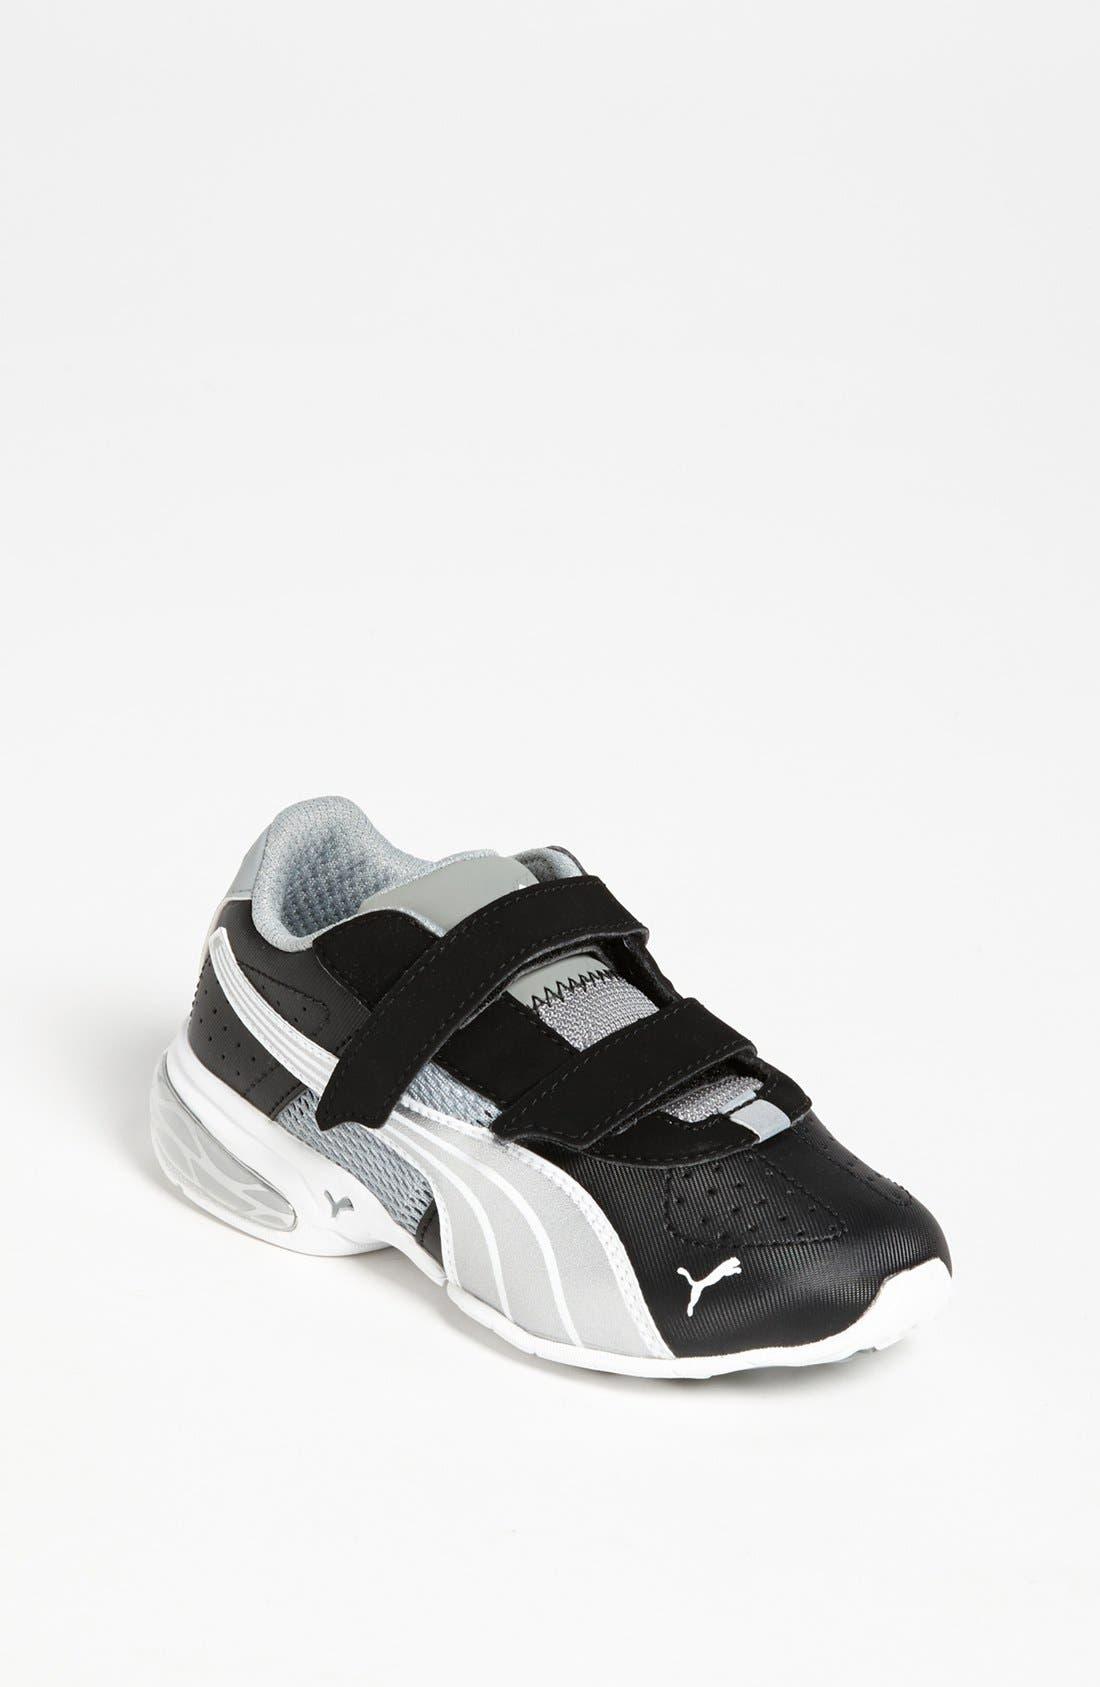 Alternate Image 1 Selected - PUMA 'Cell Surin V' Sneaker (Baby, Walker, Toddler & Little Kid)